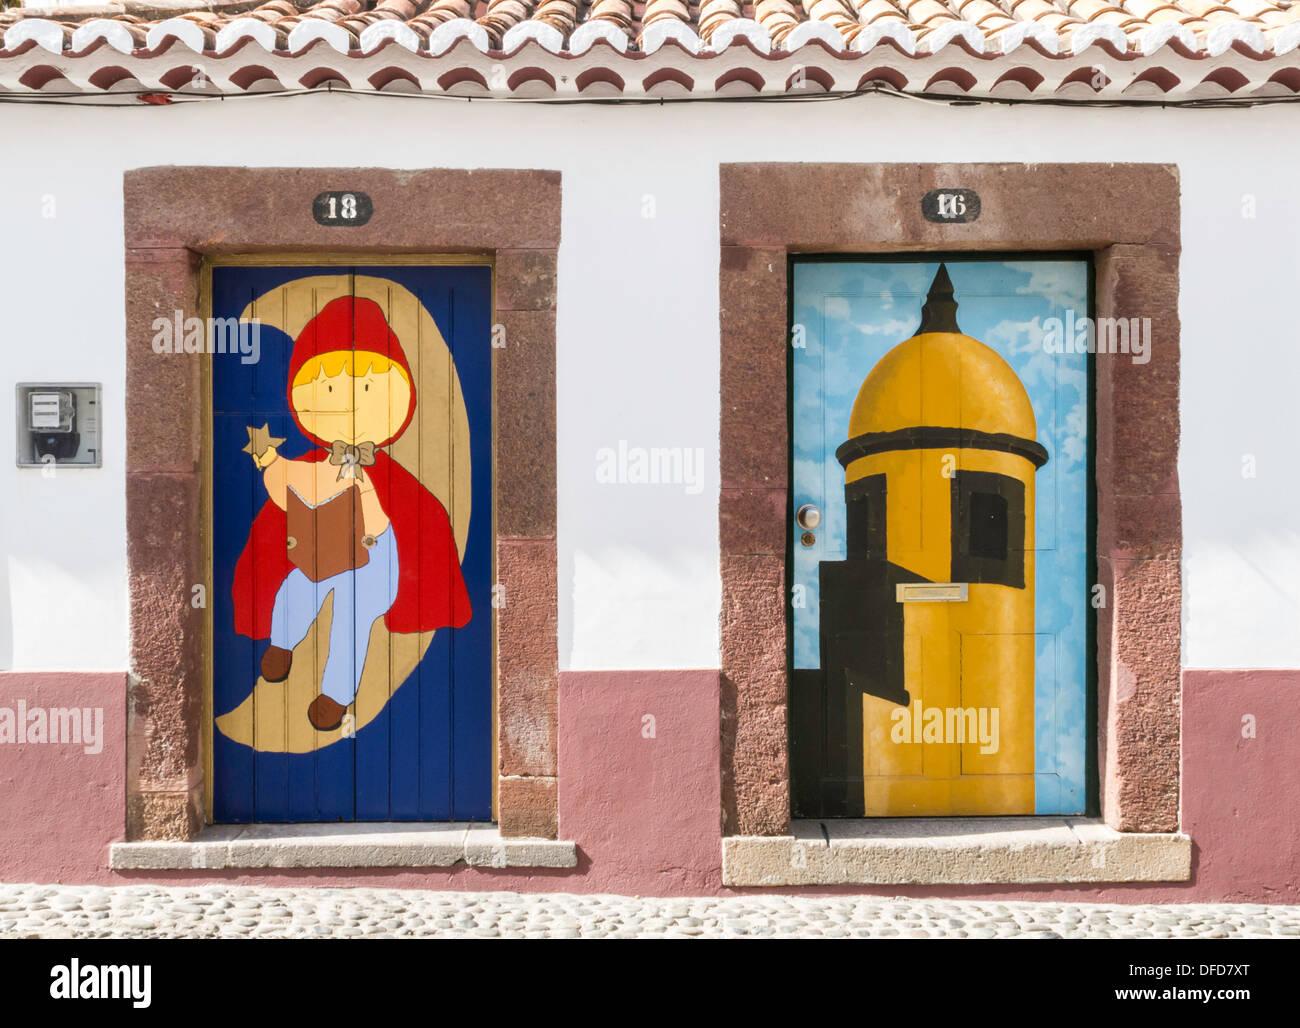 Painted Doors in Rua de Santa Maria Funchal Madeira - Stock Image